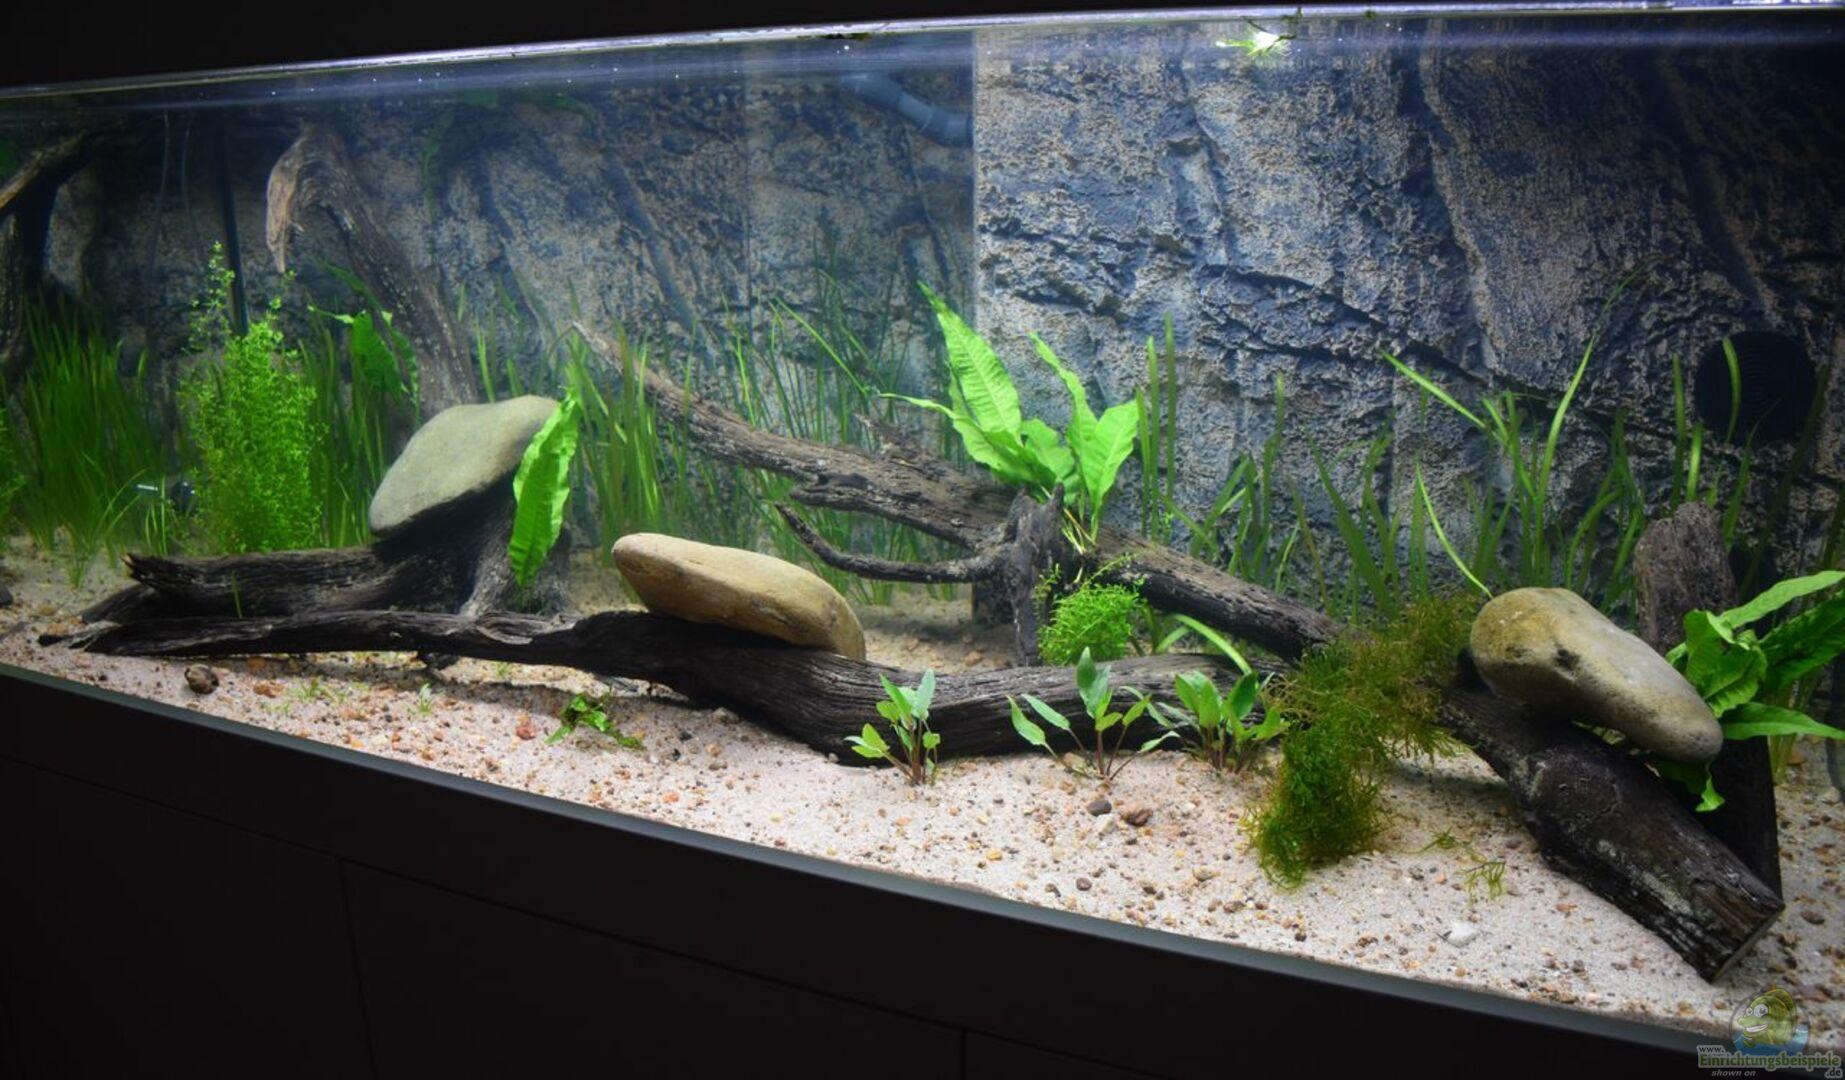 aquarium von christian andreas 31124 qiupu river. Black Bedroom Furniture Sets. Home Design Ideas